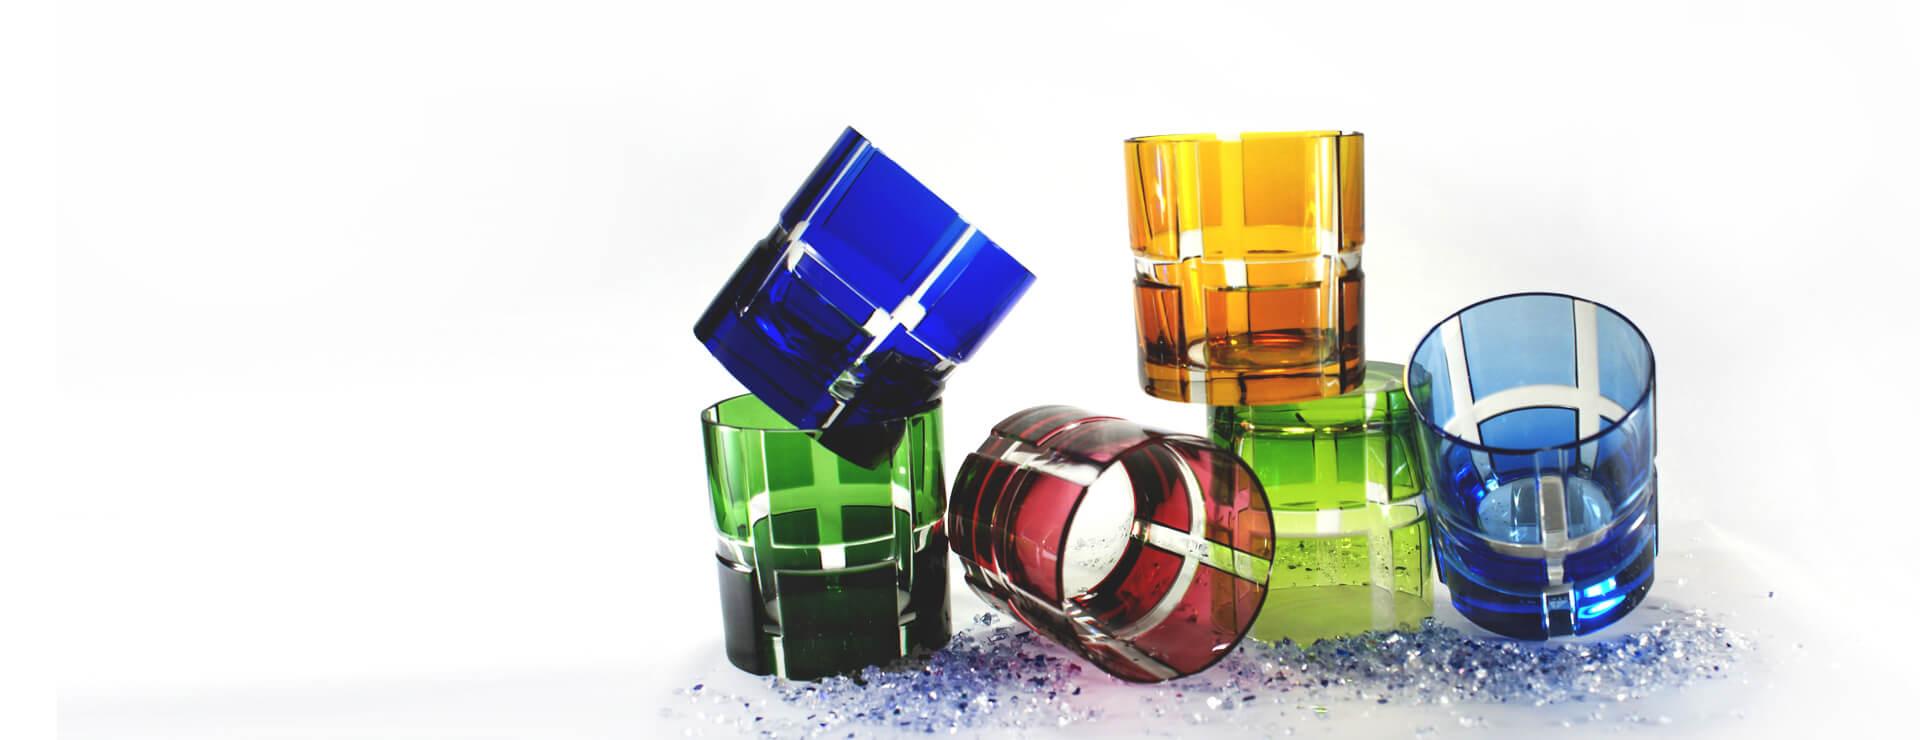 Whiskytumbler Quadrone